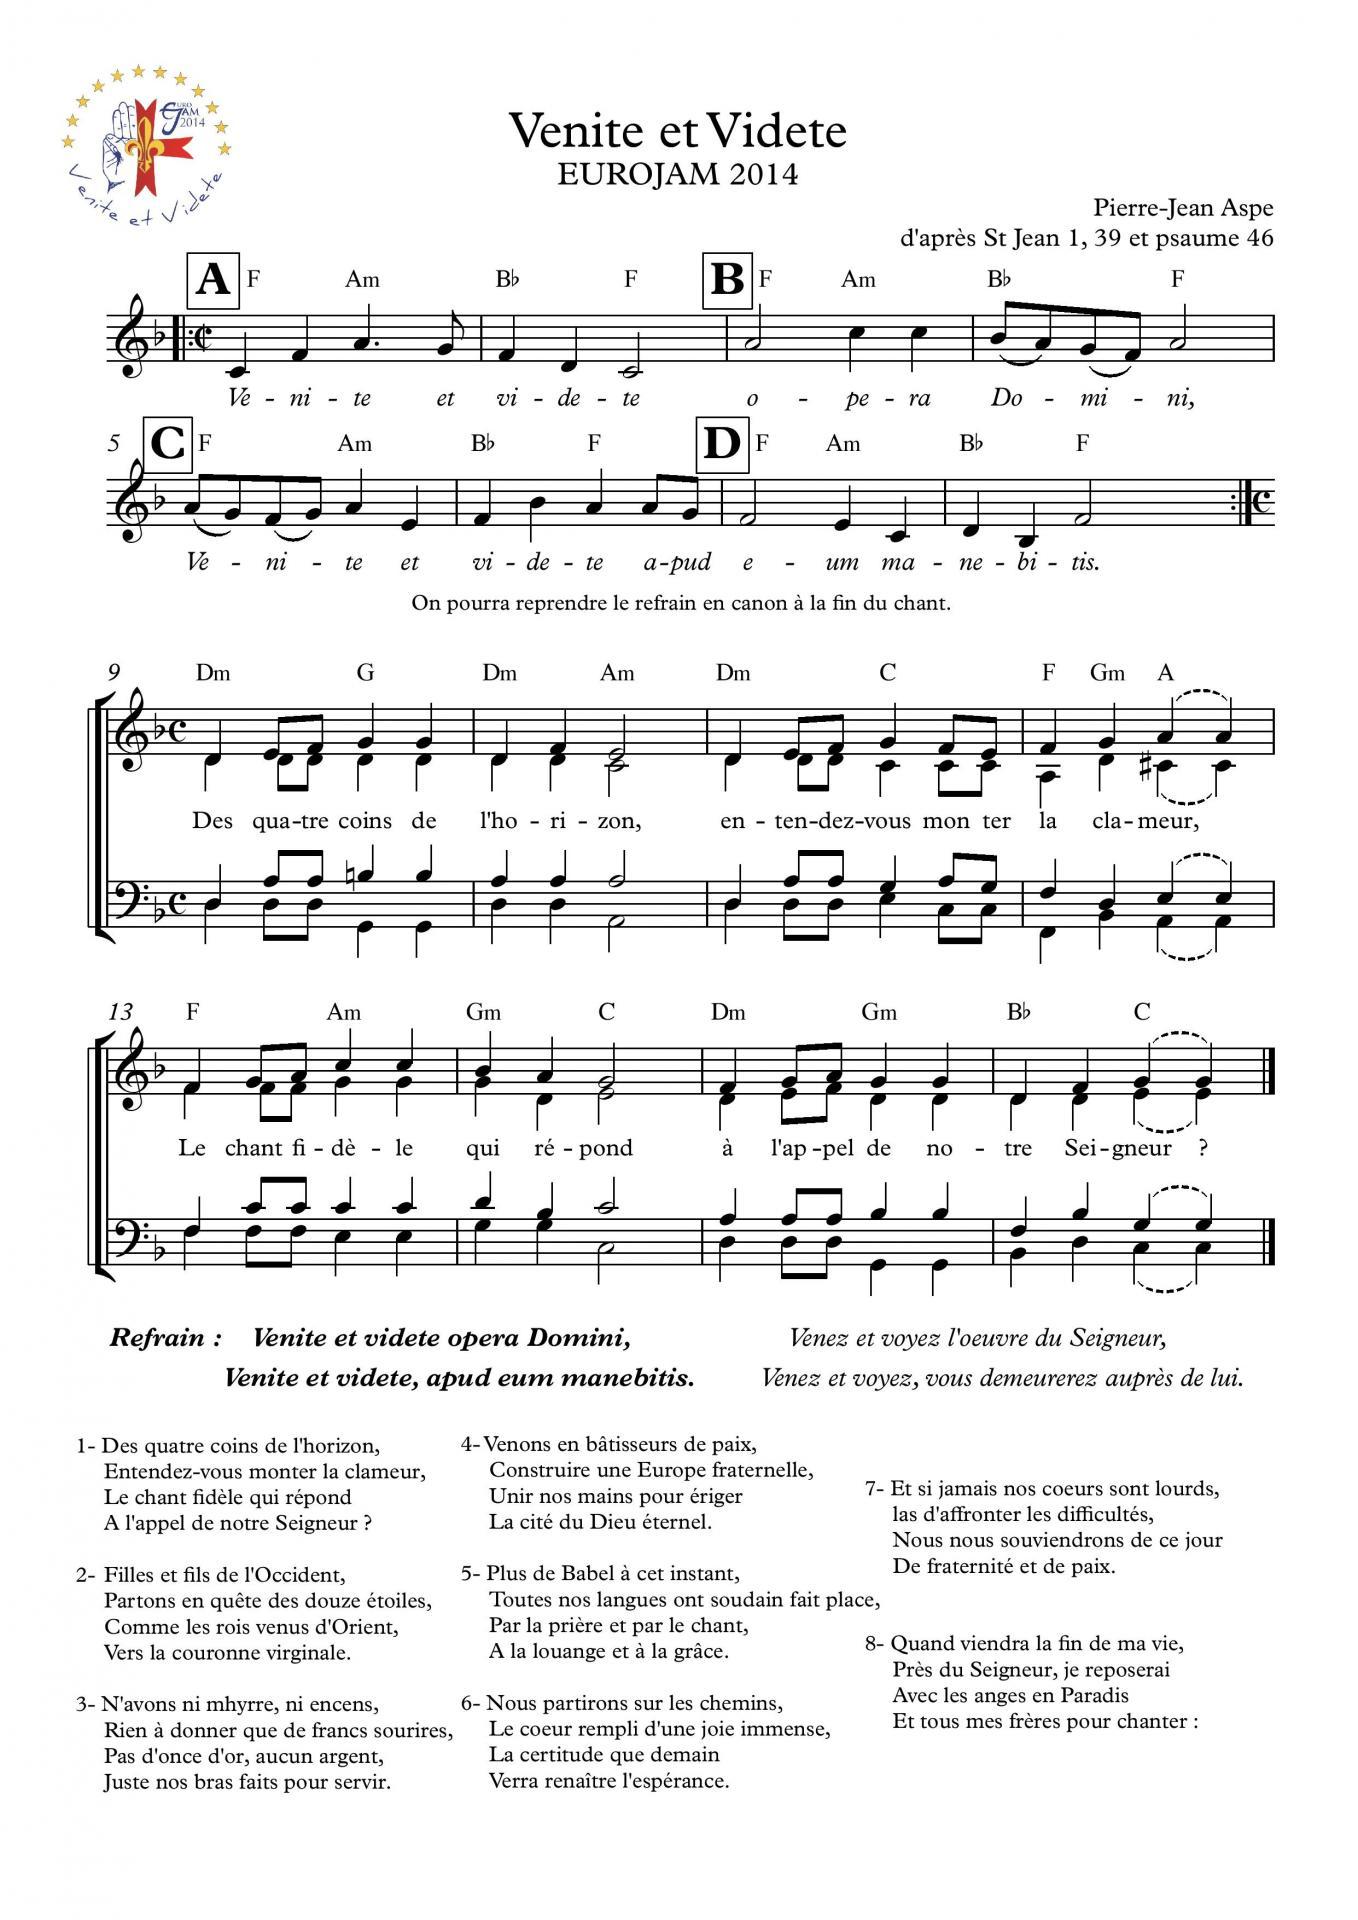 Sc expression hymne venite videte page 001